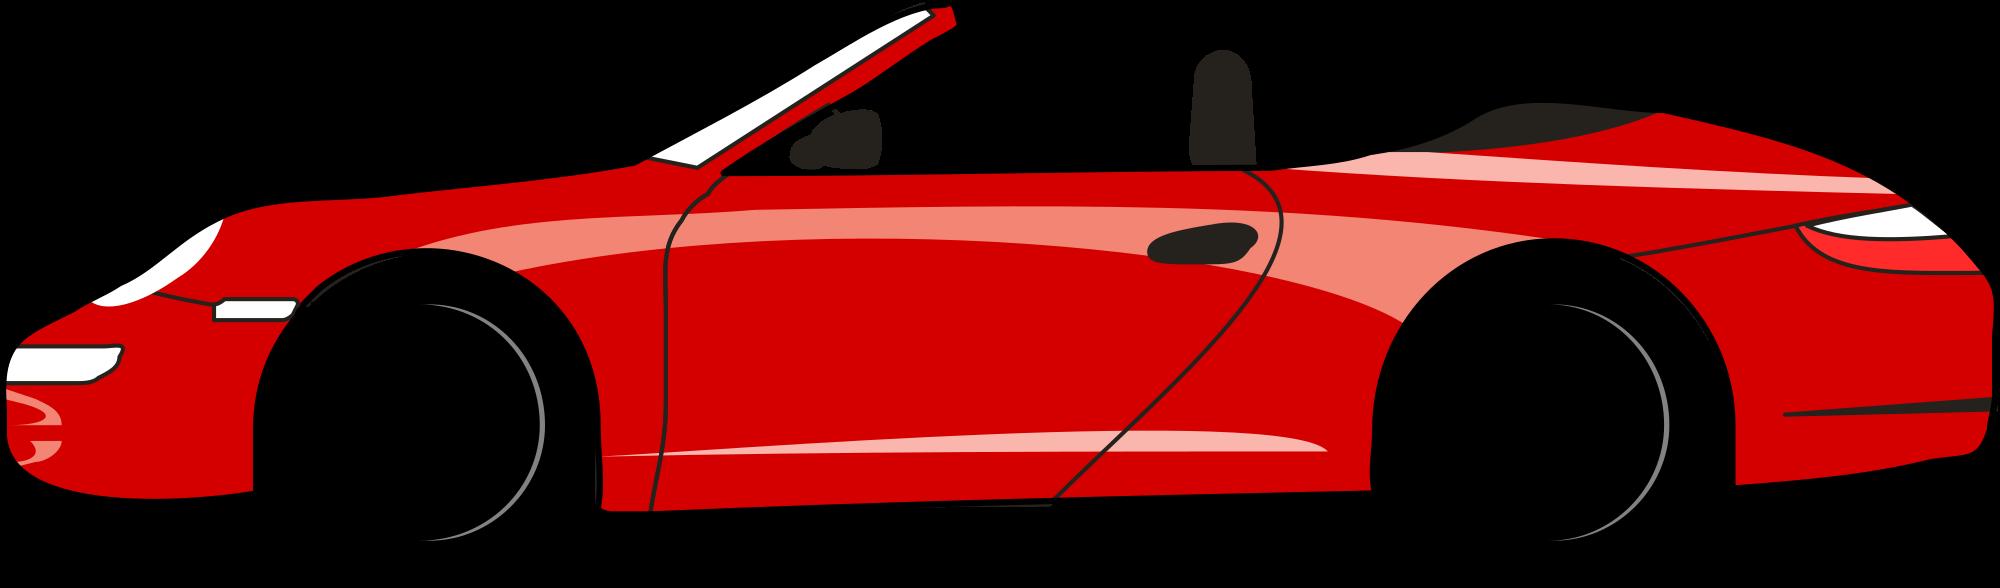 2000x588 Disney Cars Vector Art